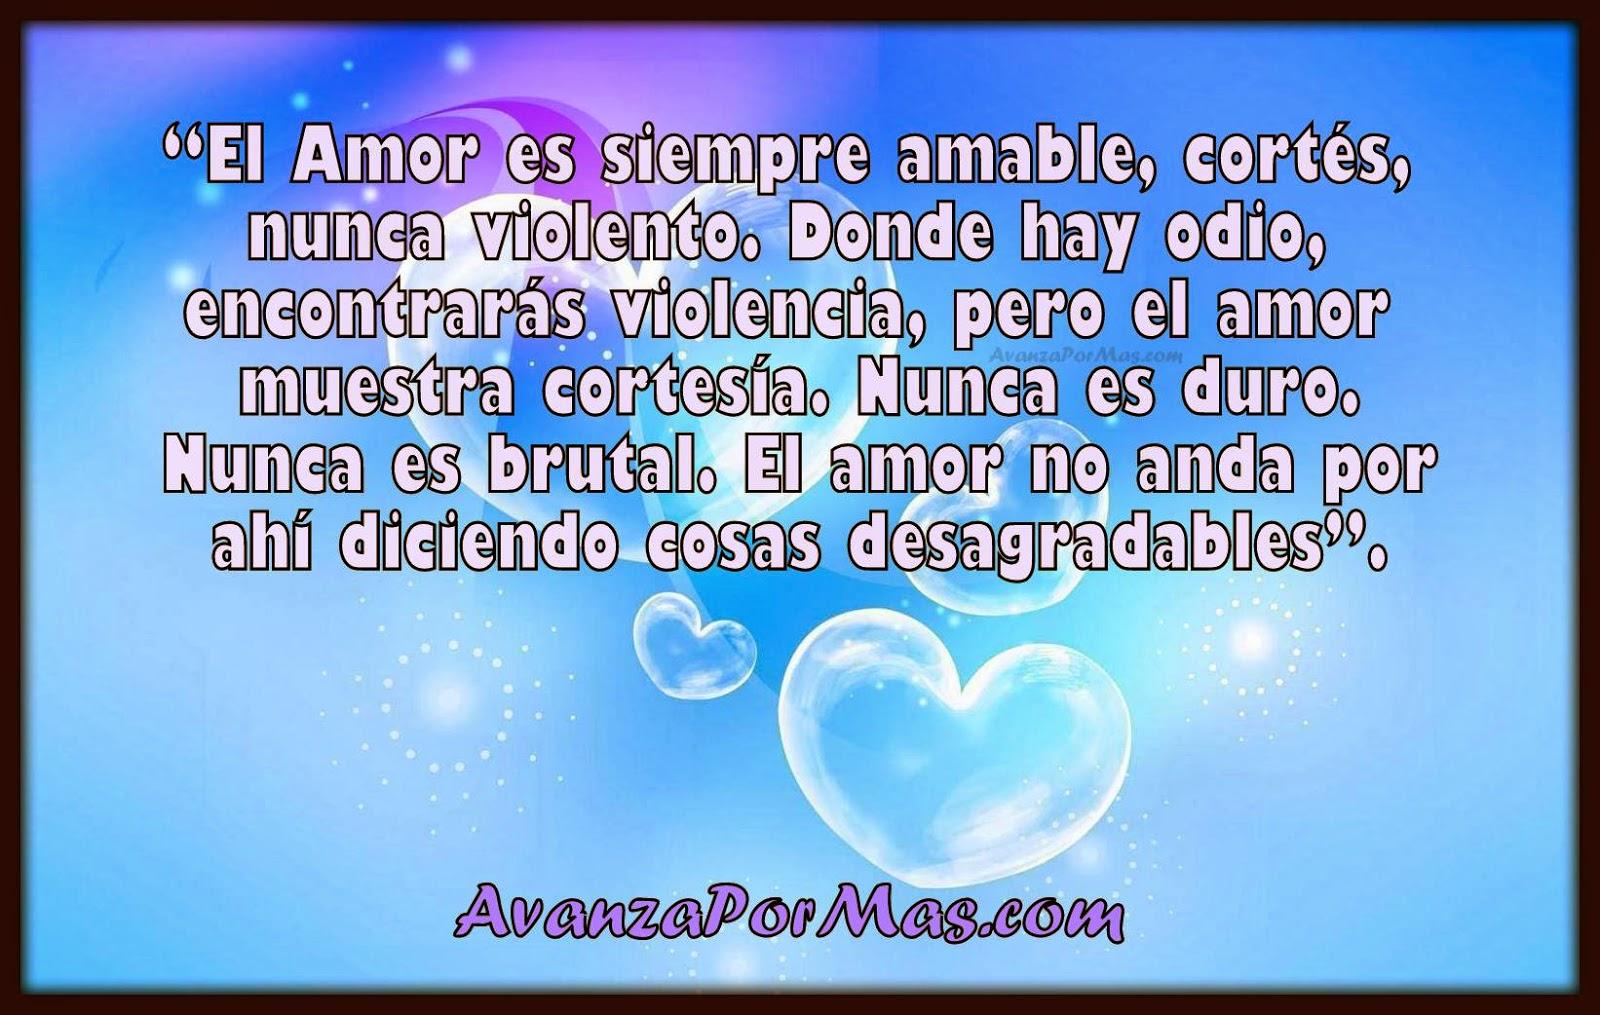 Imagenes de Amor con Frases Bonitas! - imagenes.cristianas.com